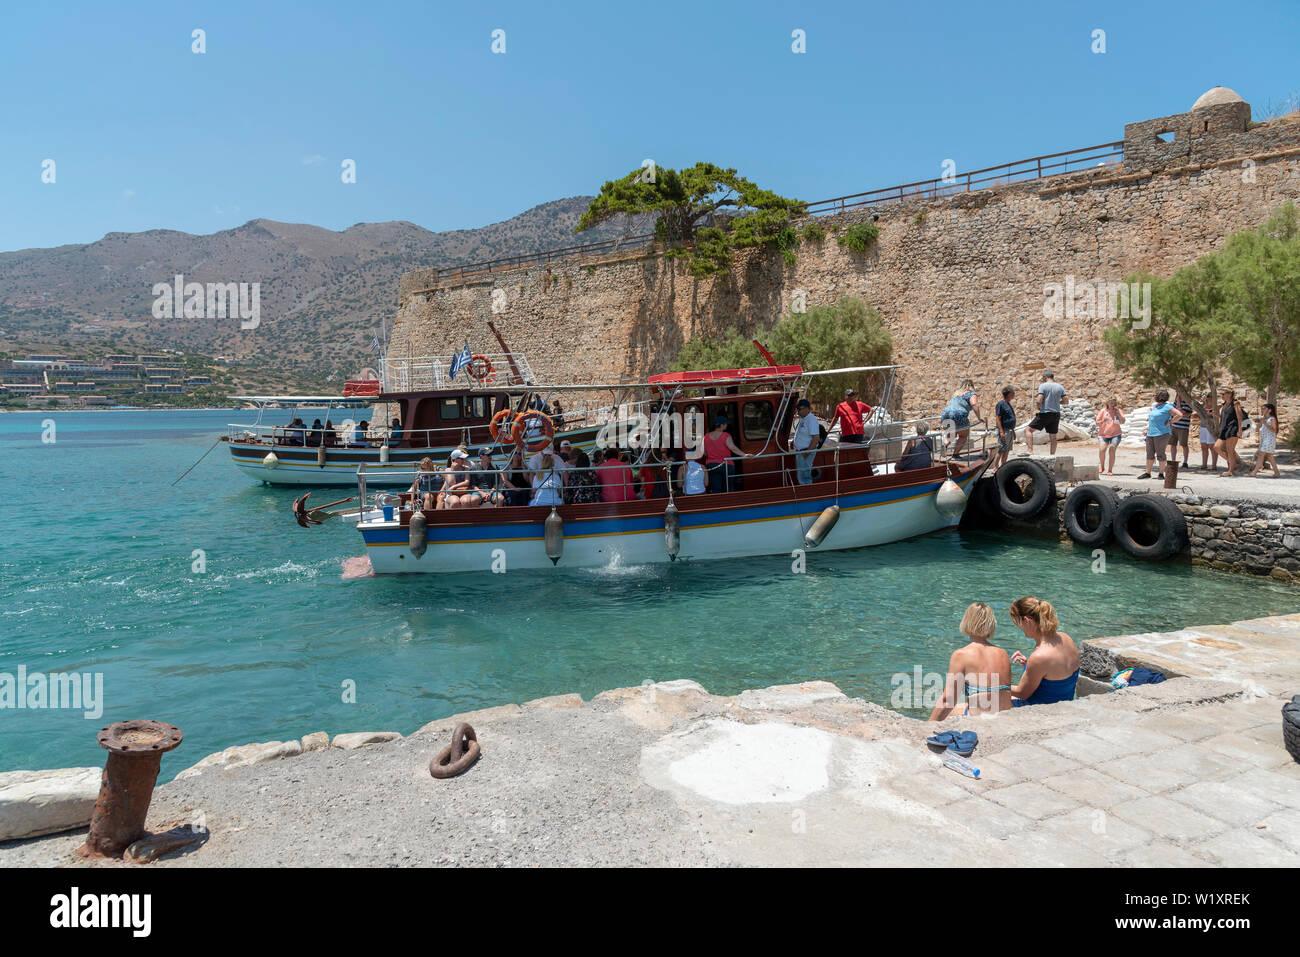 Spinalonga Island, Crete, Greece. June 2019.Small passenger ferry transporting tourists to Spinalonga a former Leper Colony. - Stock Image